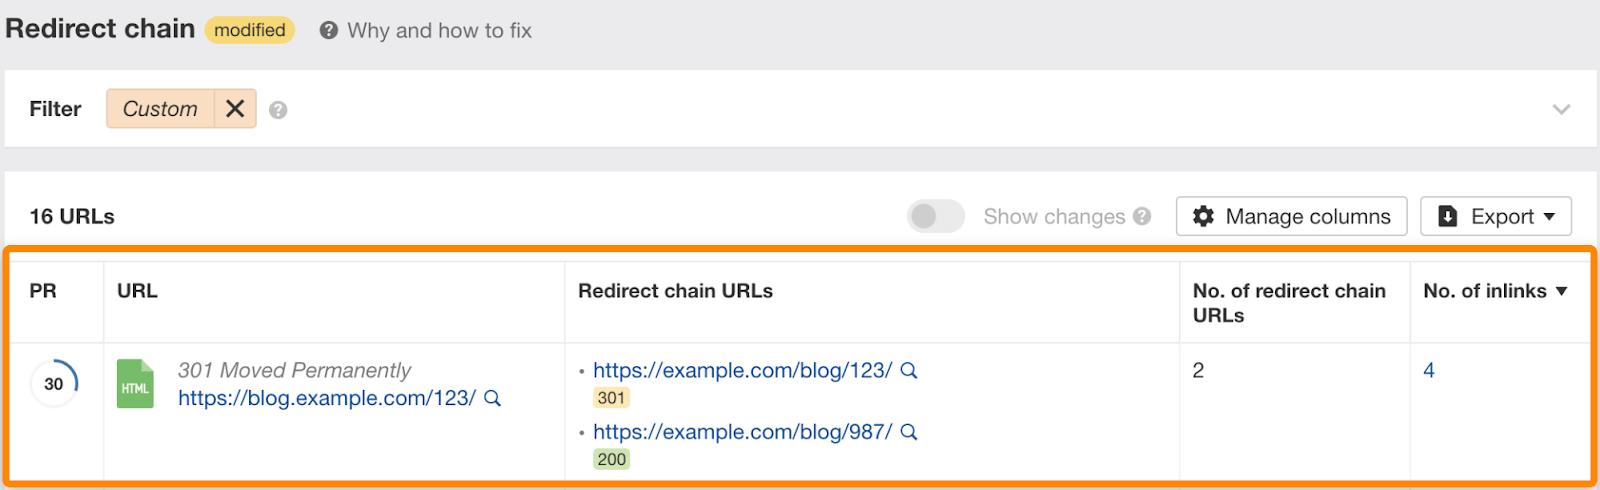 9-redirect-chains